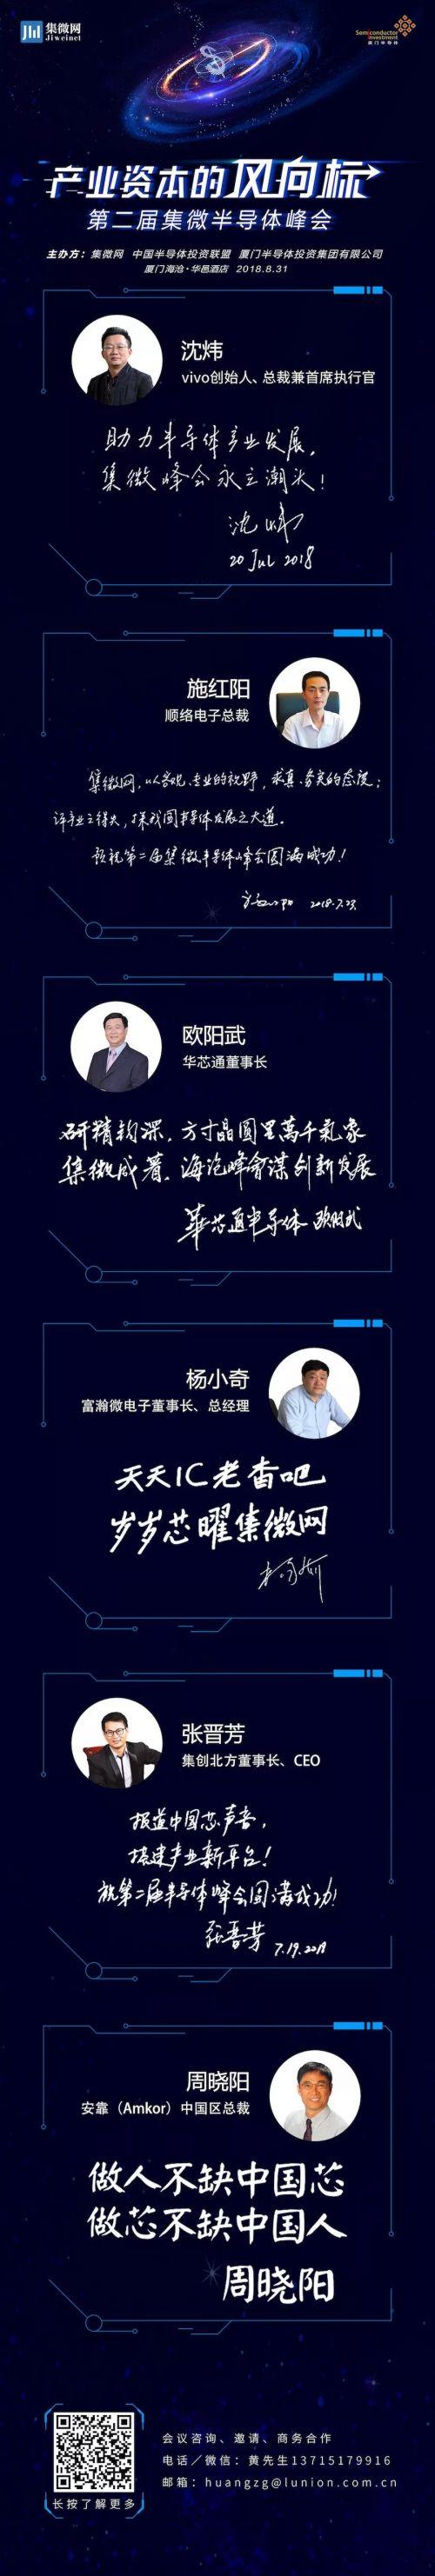 Arm吴雄昂、黄汪、石磊、张世龙、林永育寄语峰会10